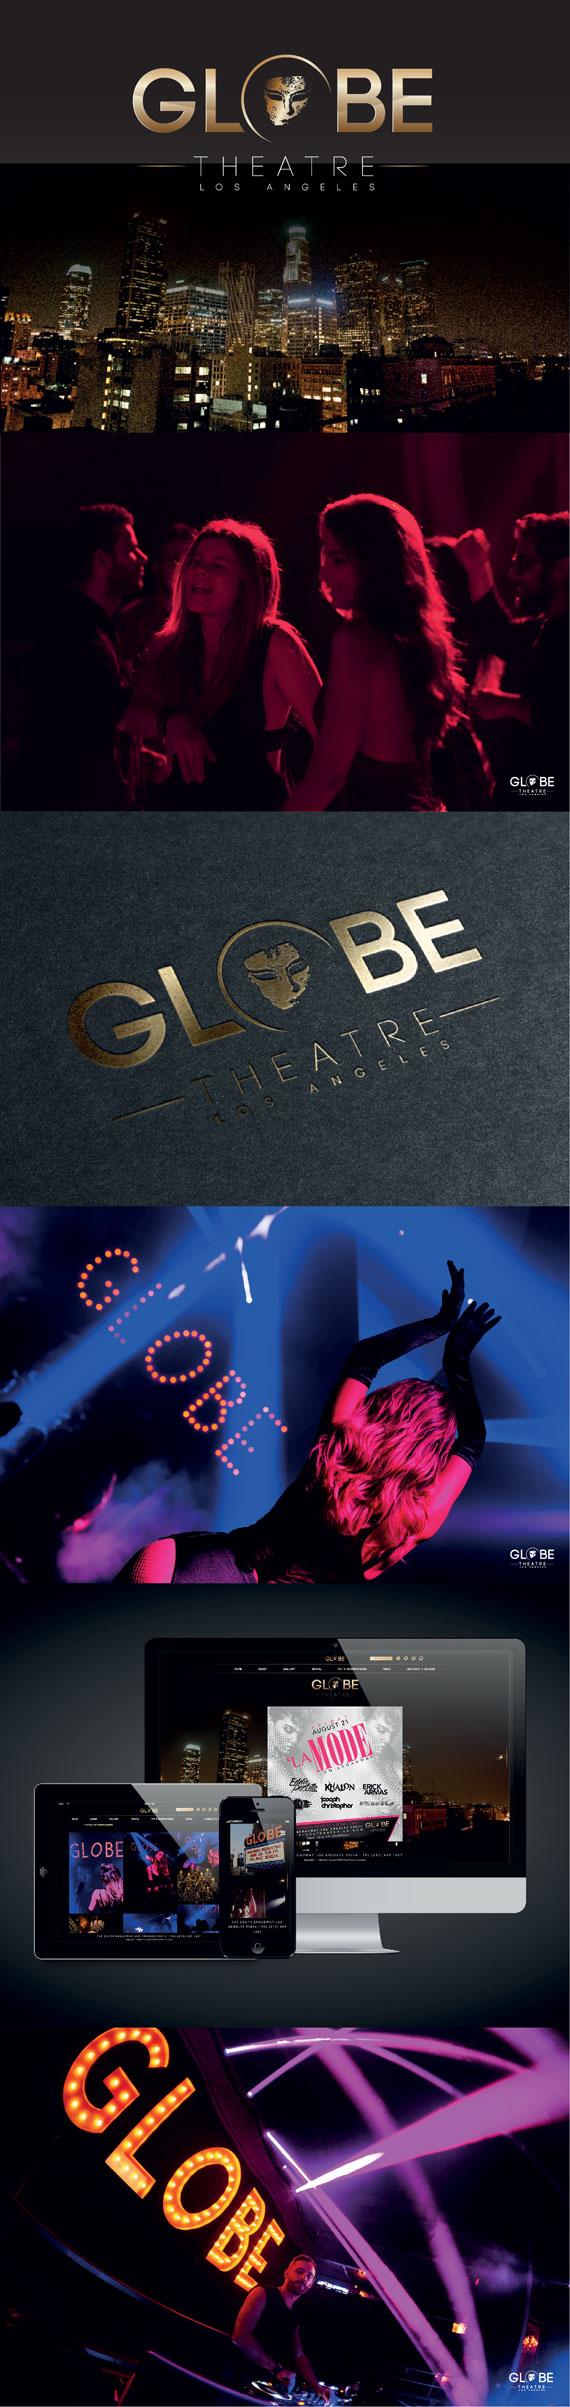 Globe Theatre Los Angeles